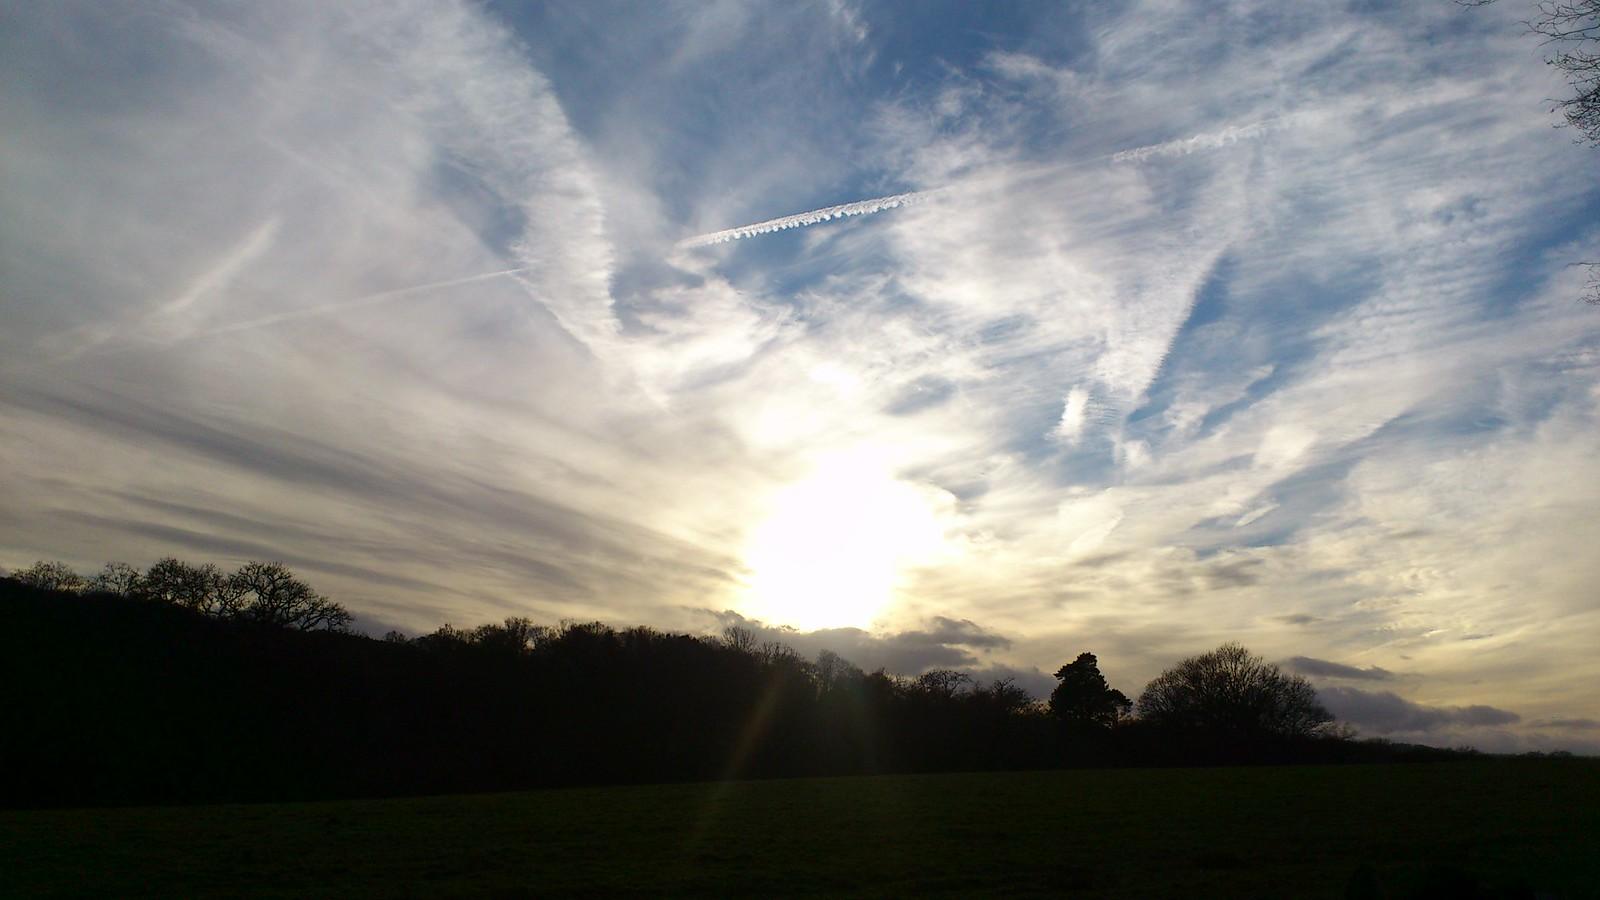 Skies over the Weald (Stonegate to Robertsbridge) Kipling's manor.